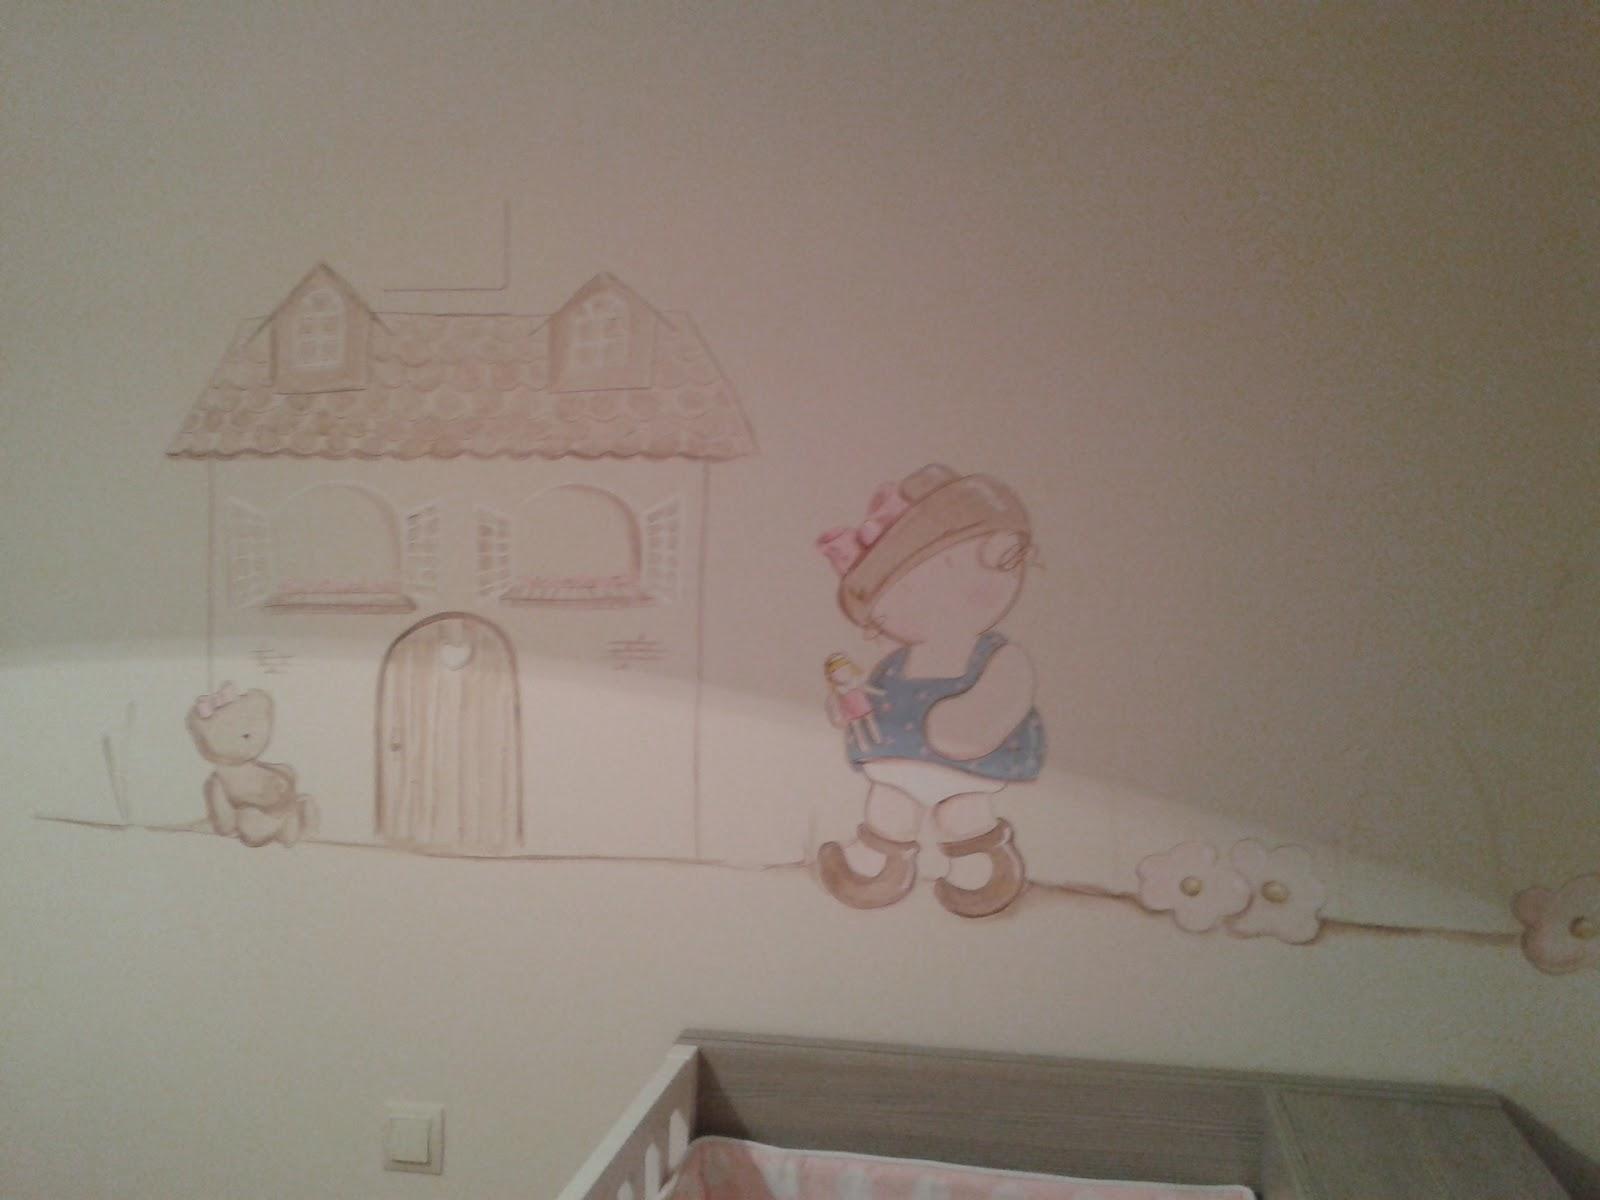 chambre bebe peinture murale 28 images chambre b 233 b 233 20 id 233 es de d 233 co et de. Black Bedroom Furniture Sets. Home Design Ideas